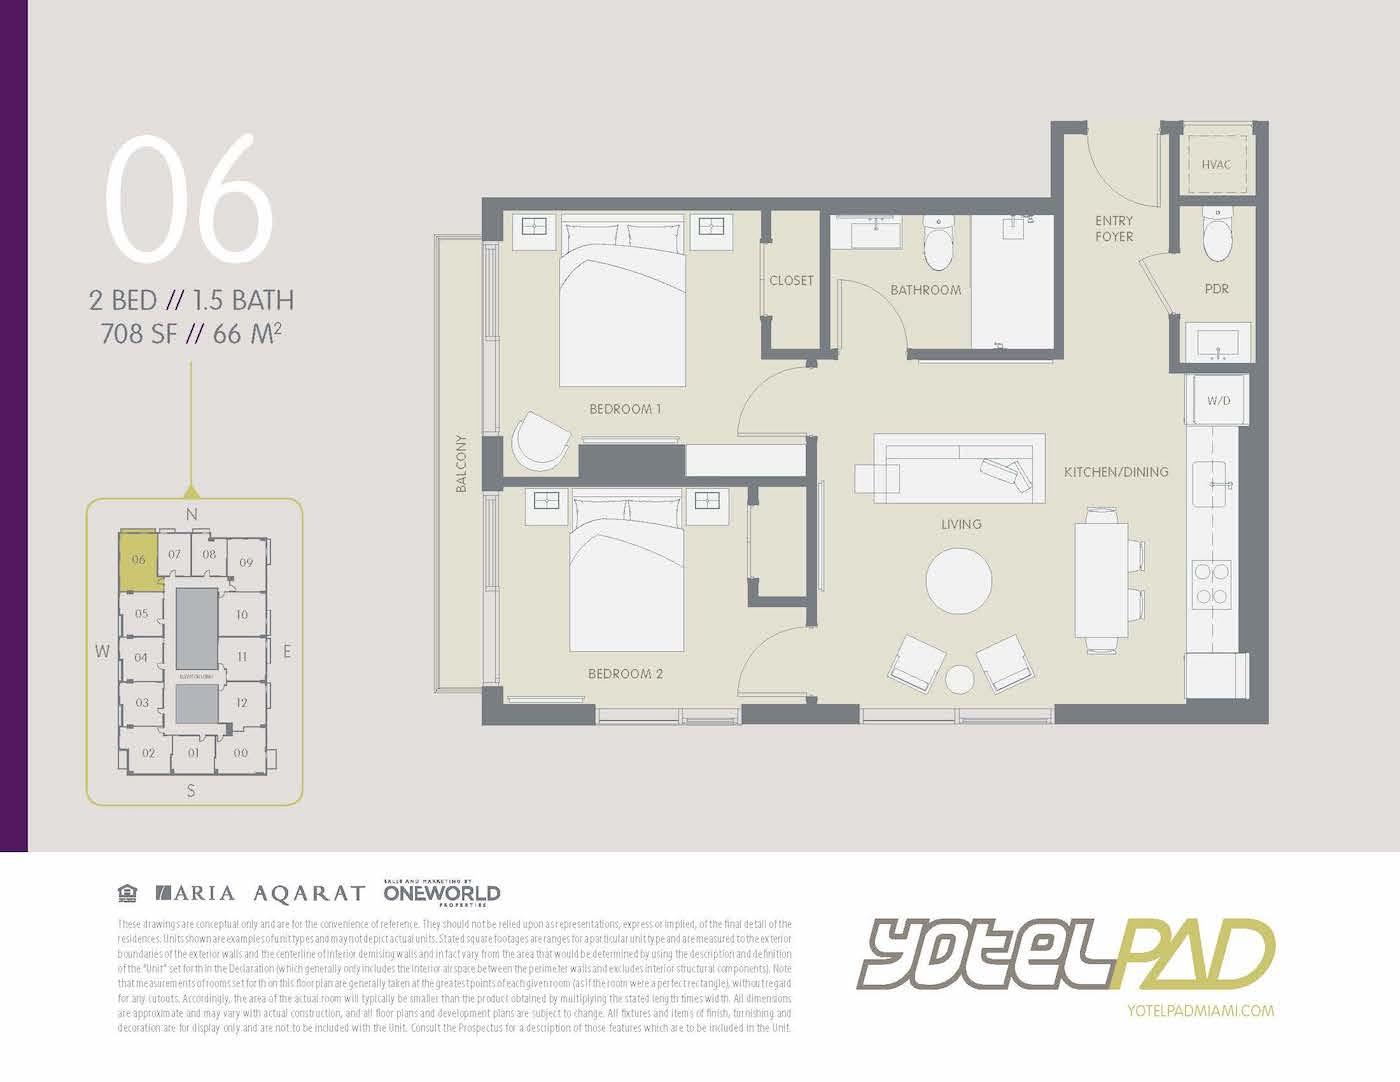 2 BED YOTEL PAD